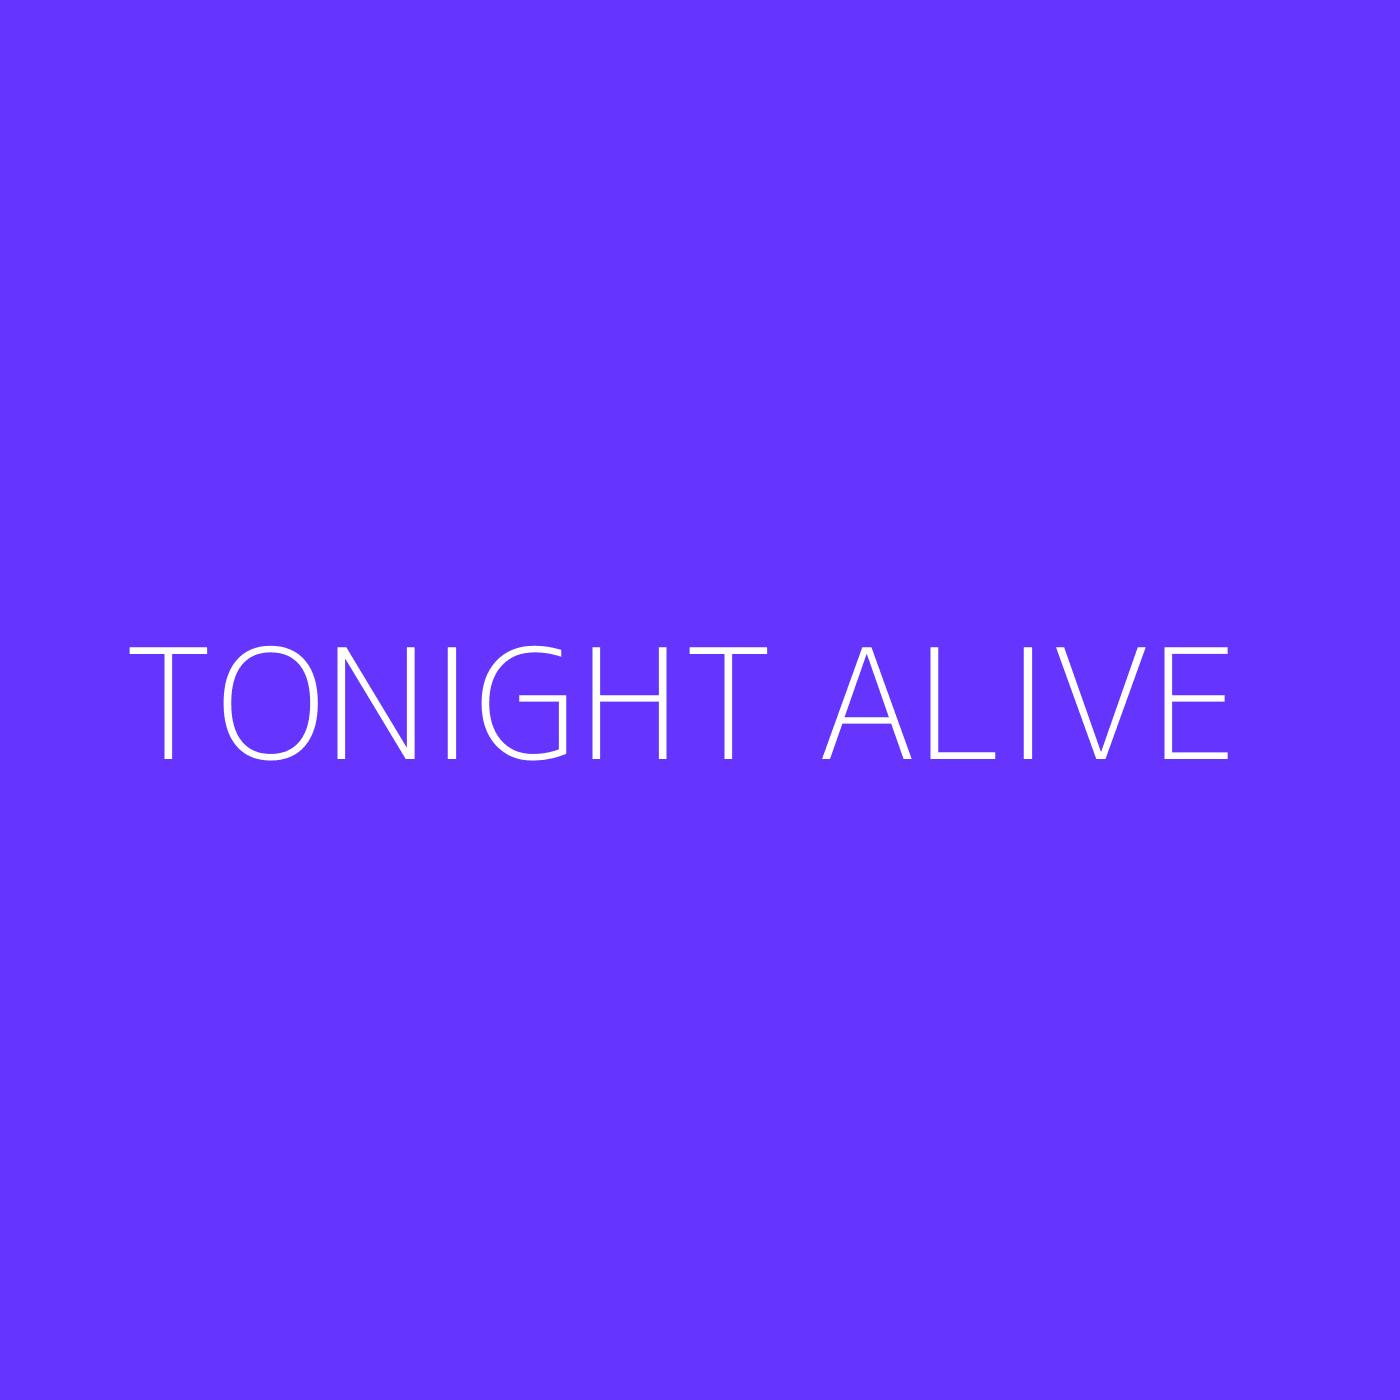 Tonight Alive Playlist Artwork